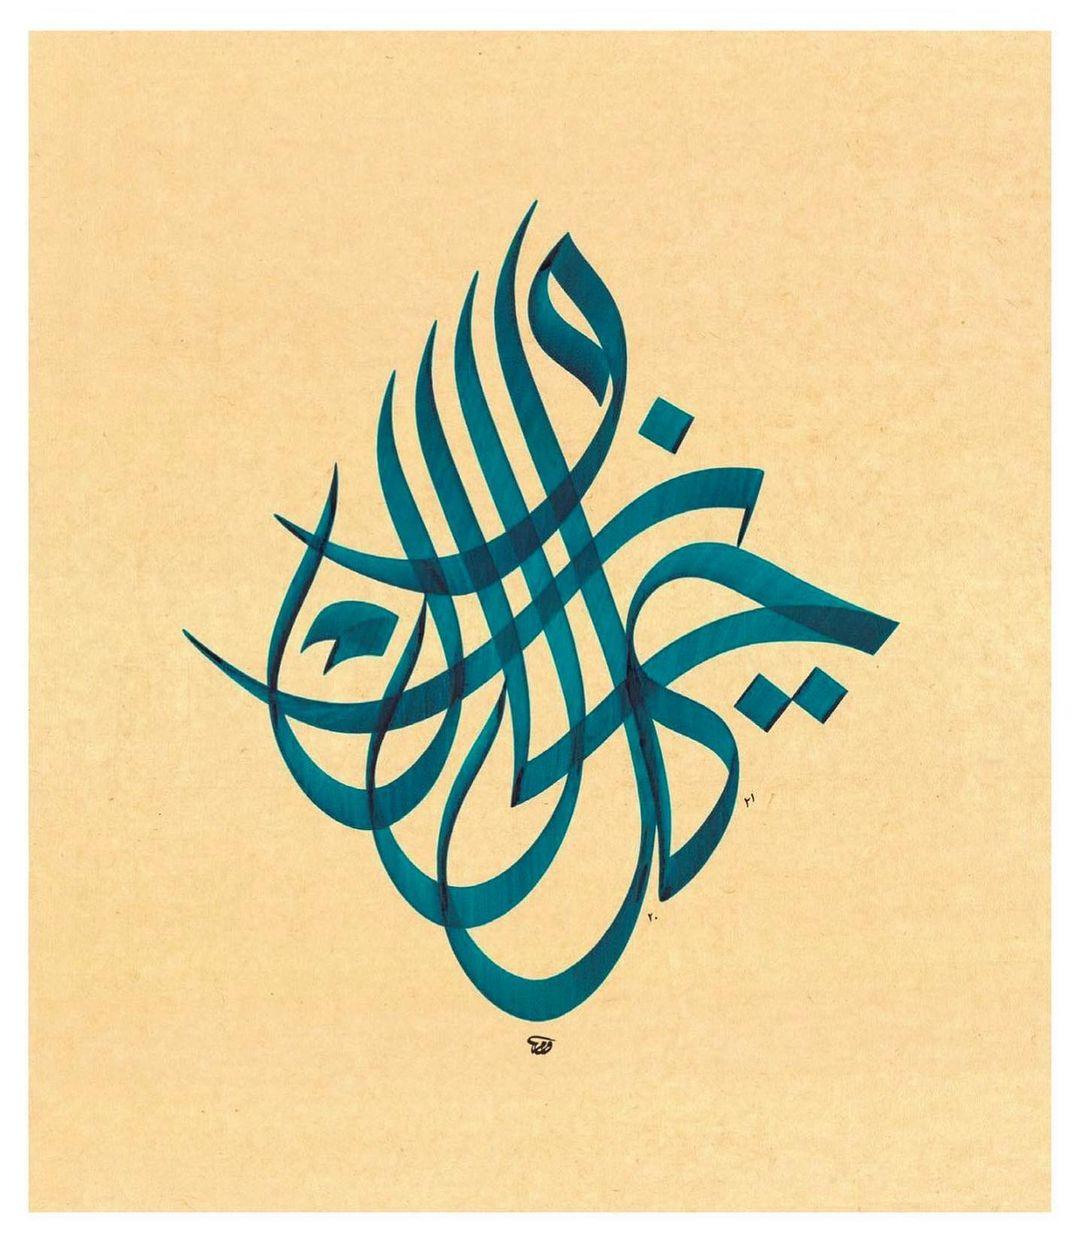 Download Kaligrafi Karya Kaligrafer Kristen This too shall pass / كل حال يزول  #wissamshawkat #art #wissam_shawkat #design #...-Wissam 1